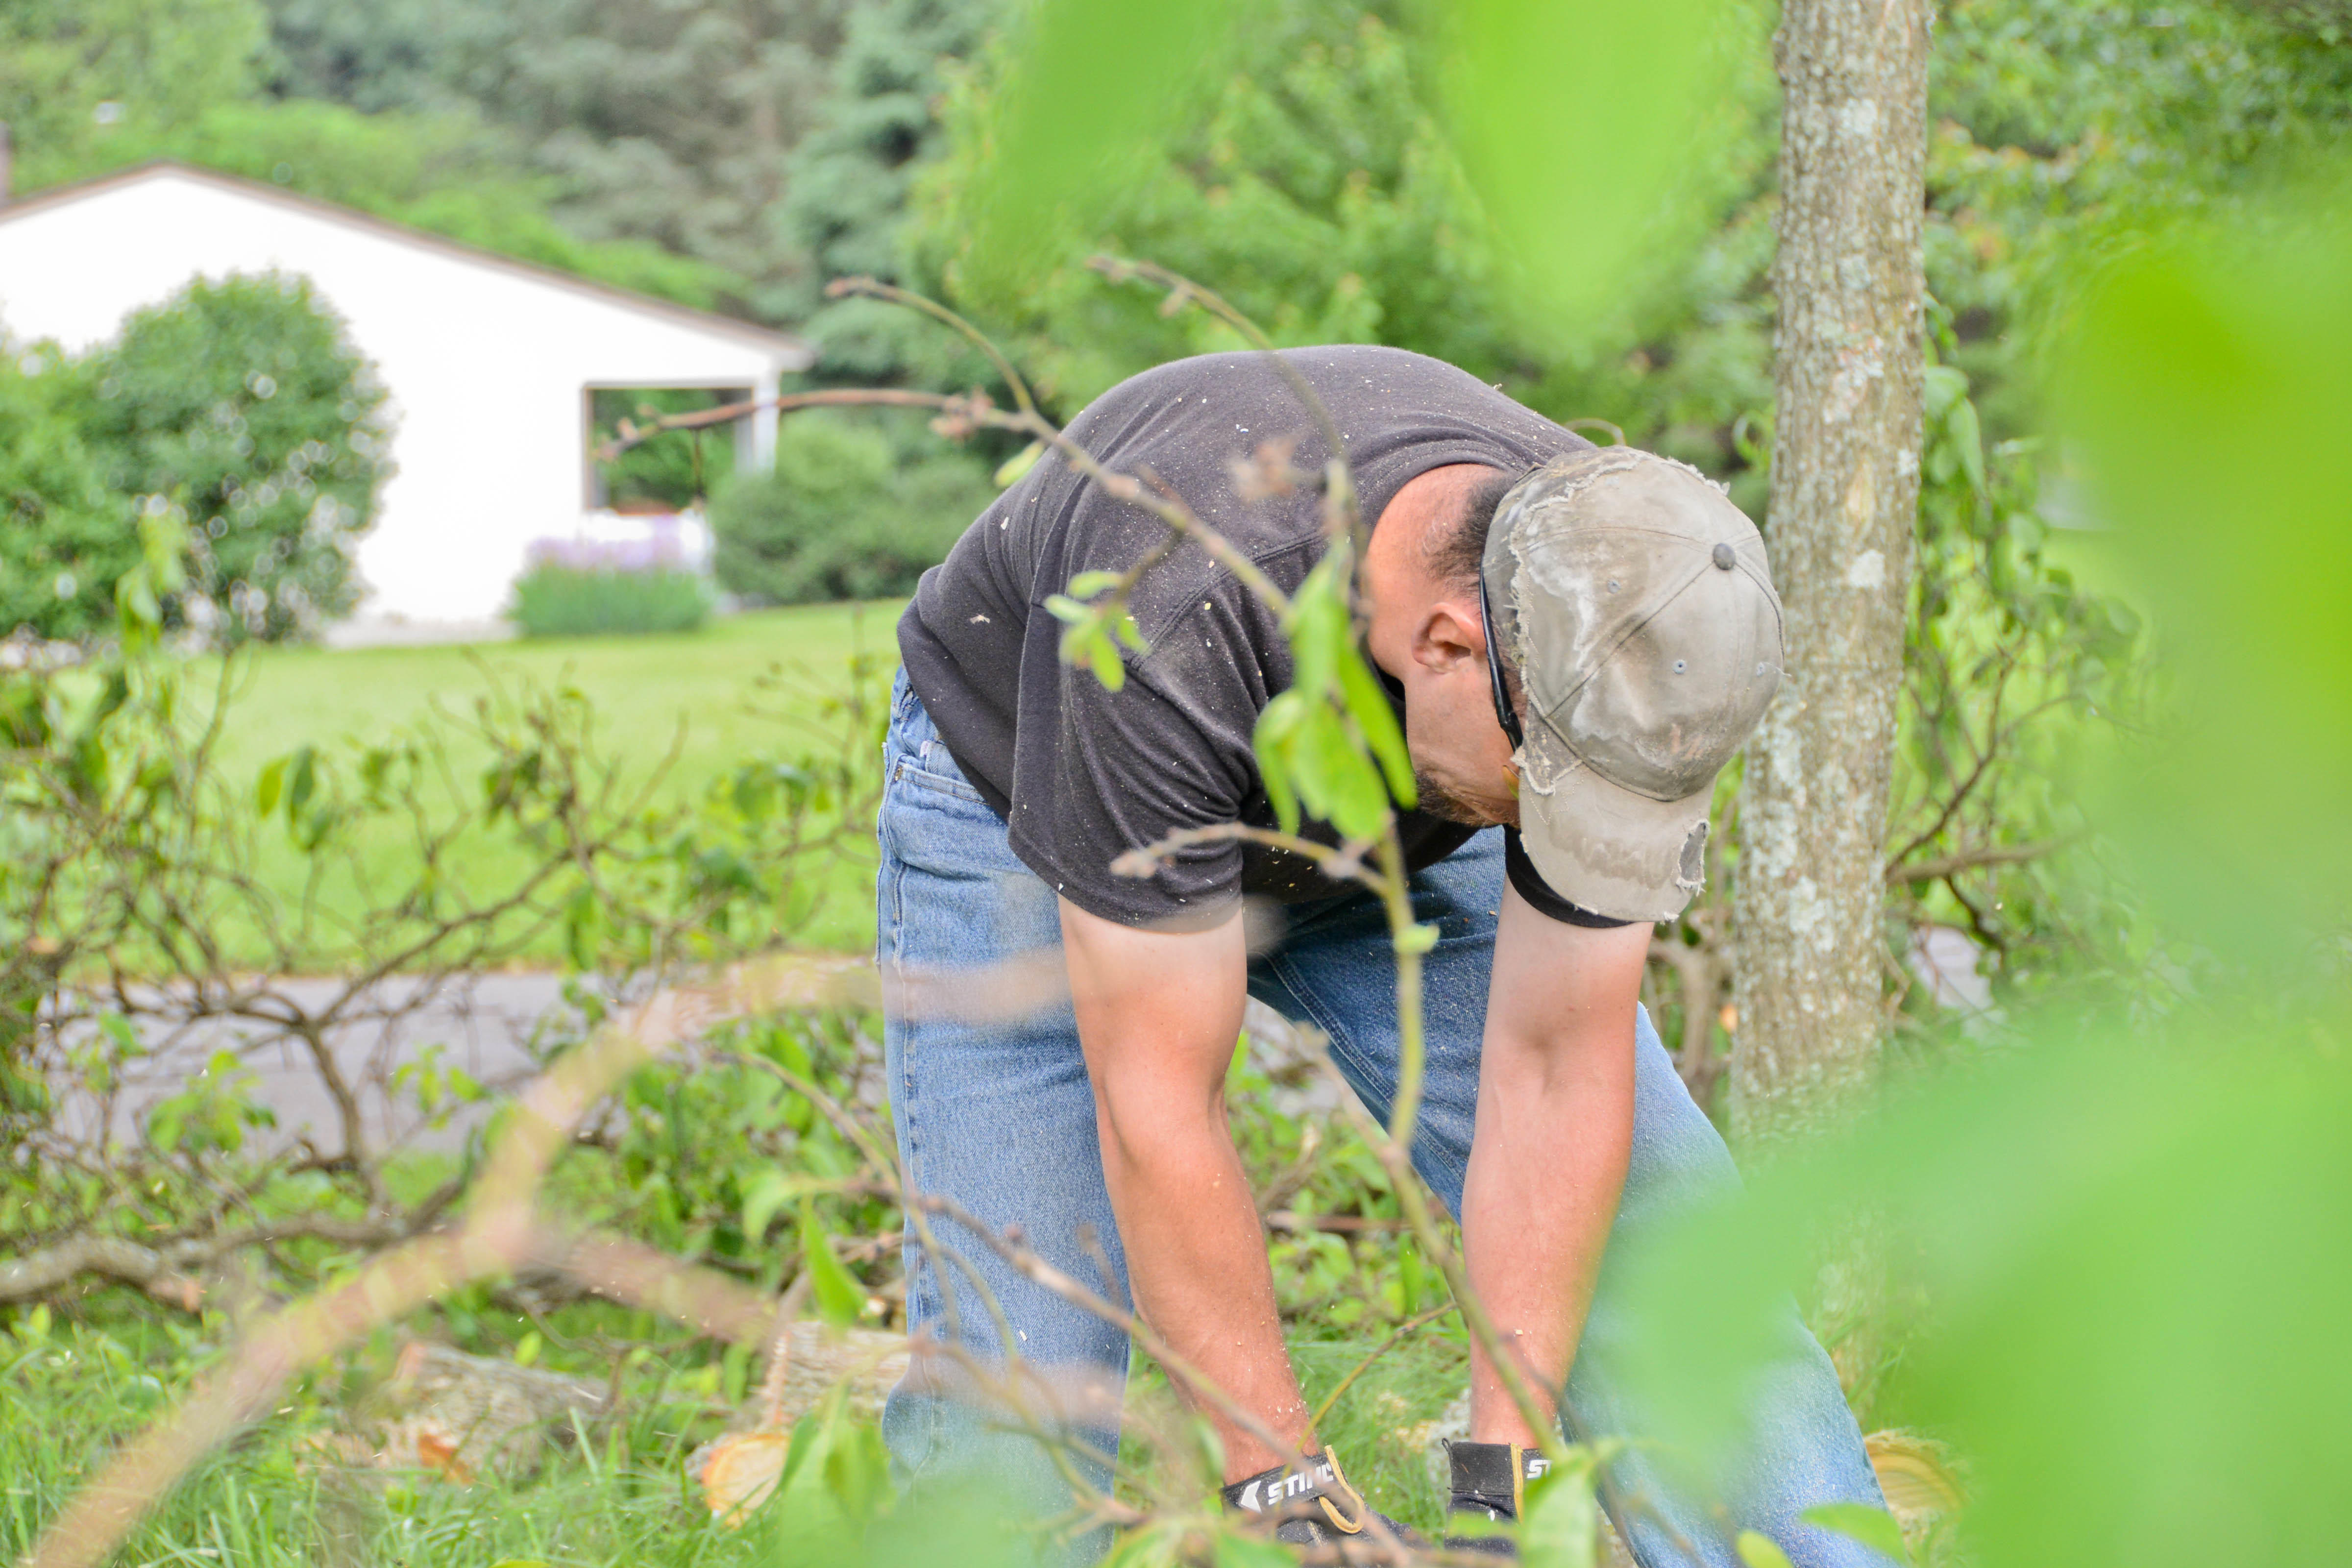 No Sweat Lawns & Trees, LLC image 2